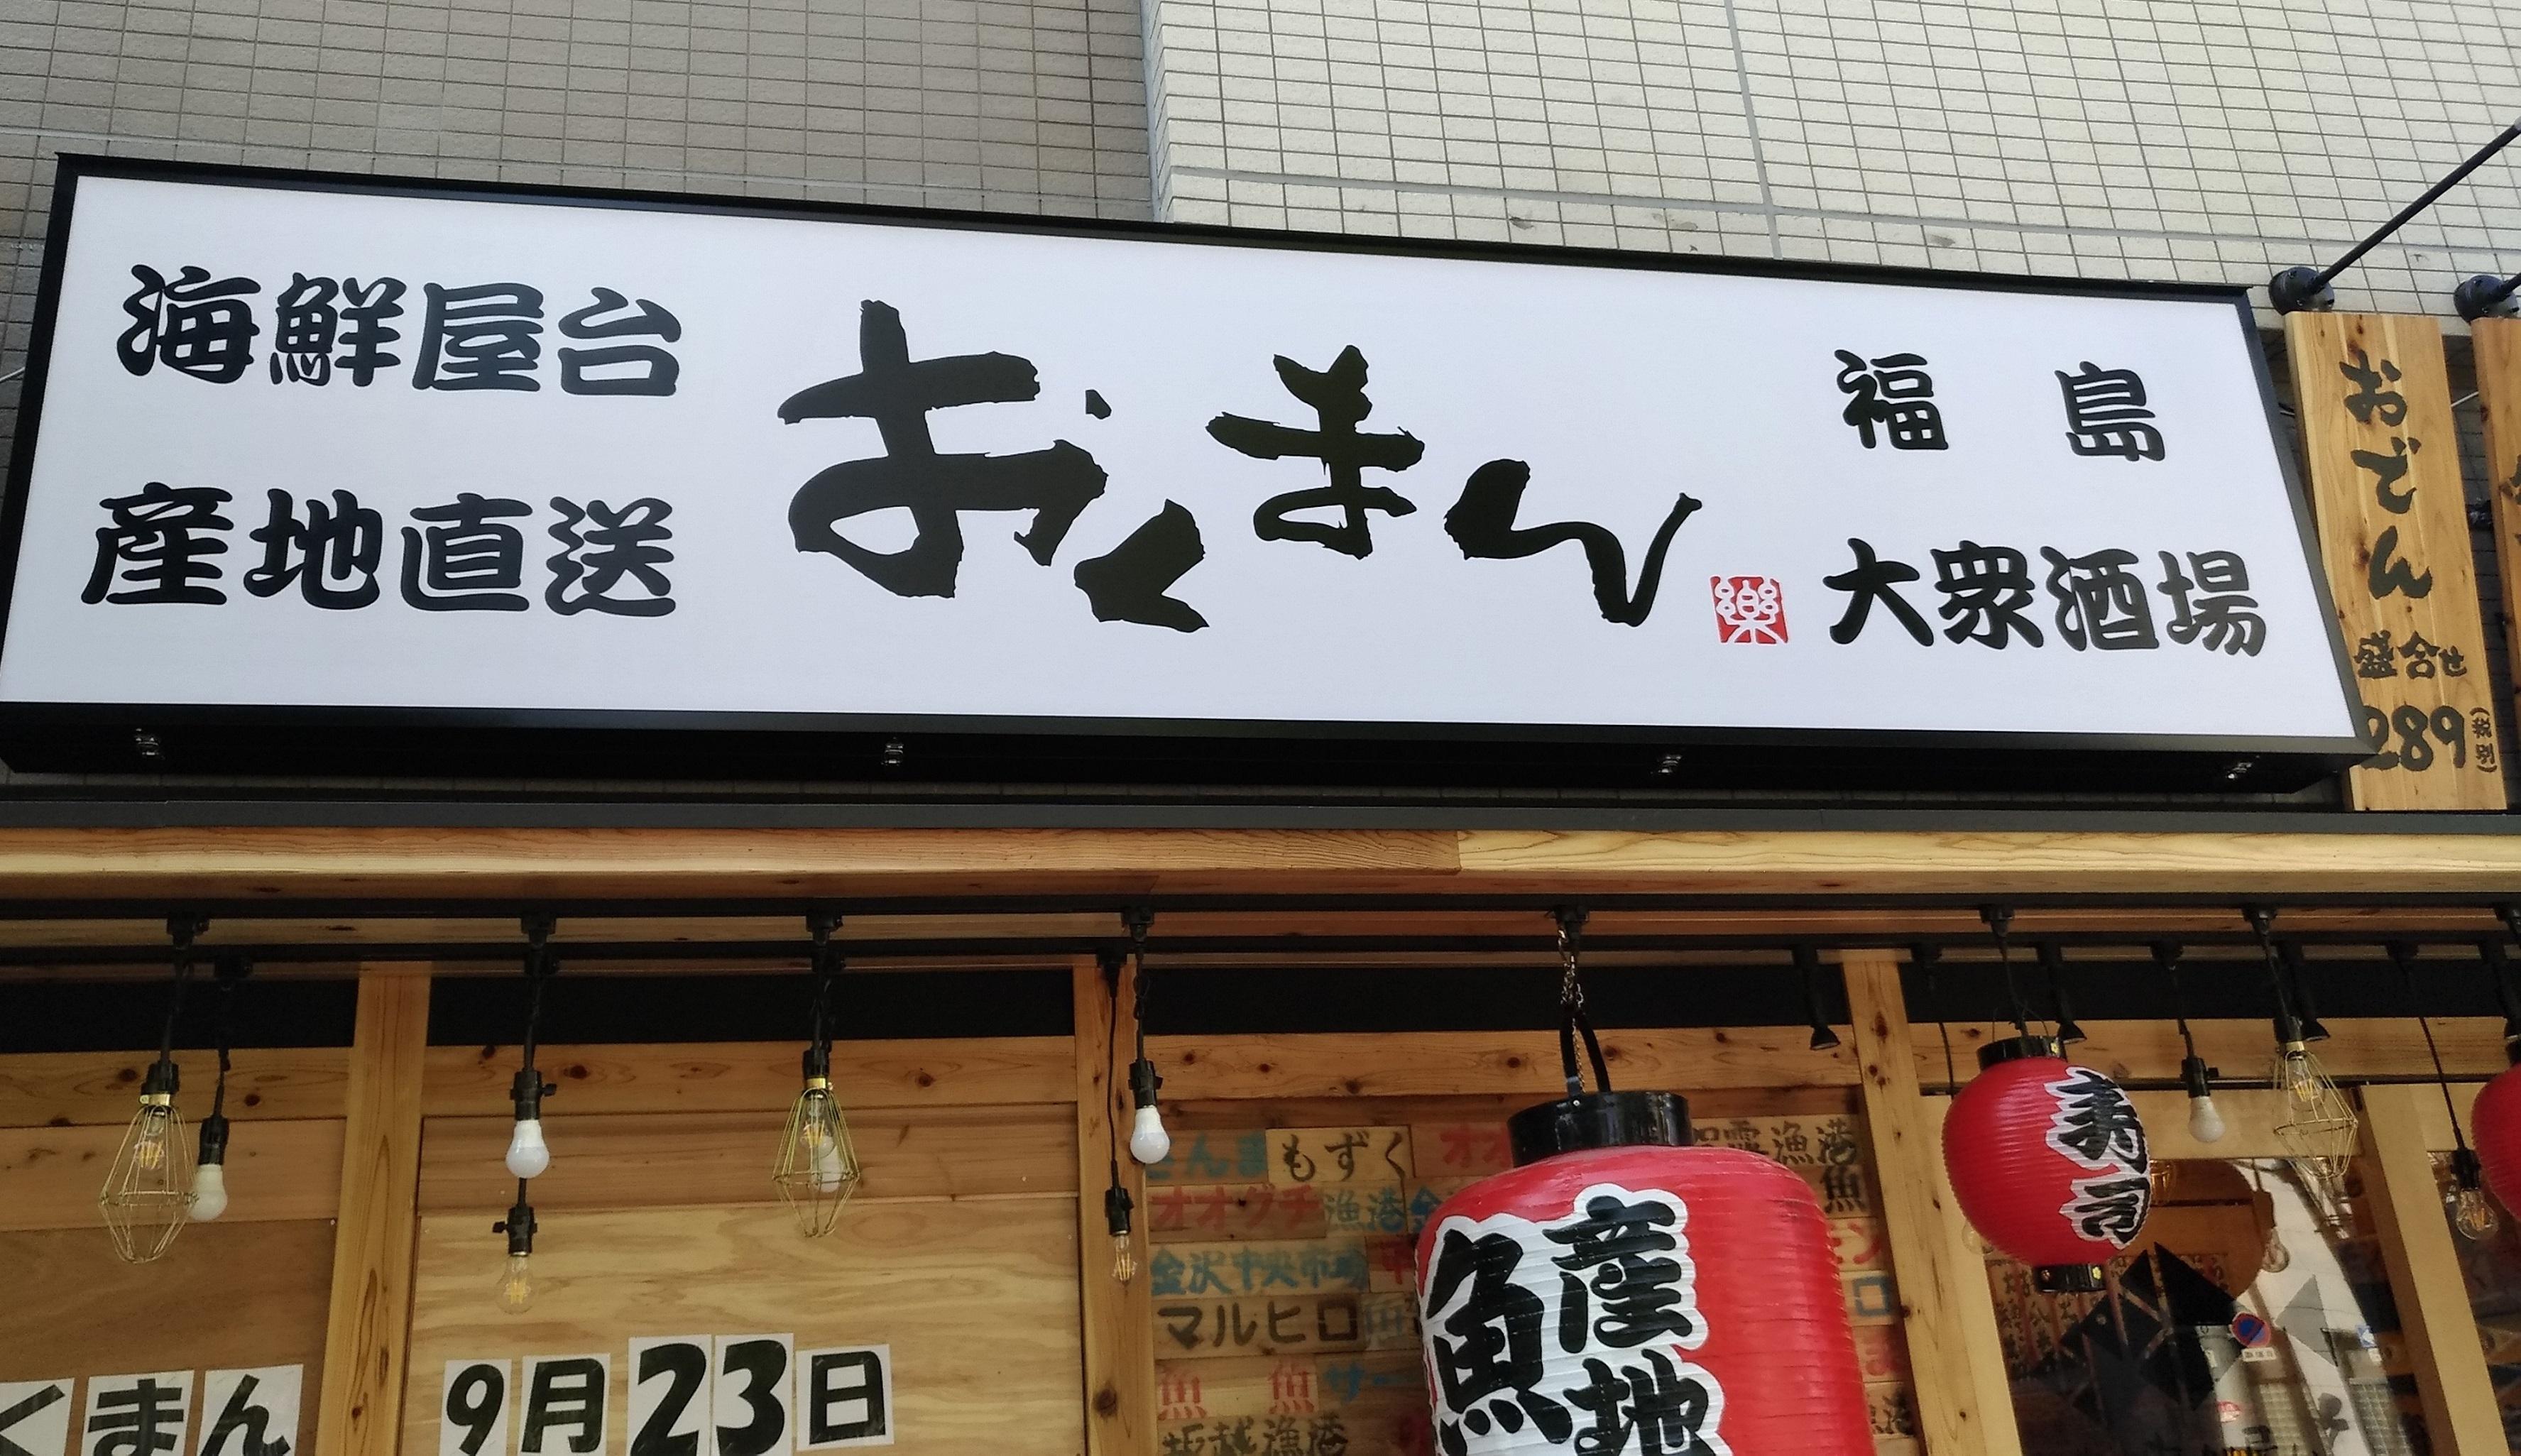 osaka_fukushima_new_kaisen_yatai_open_.jpg